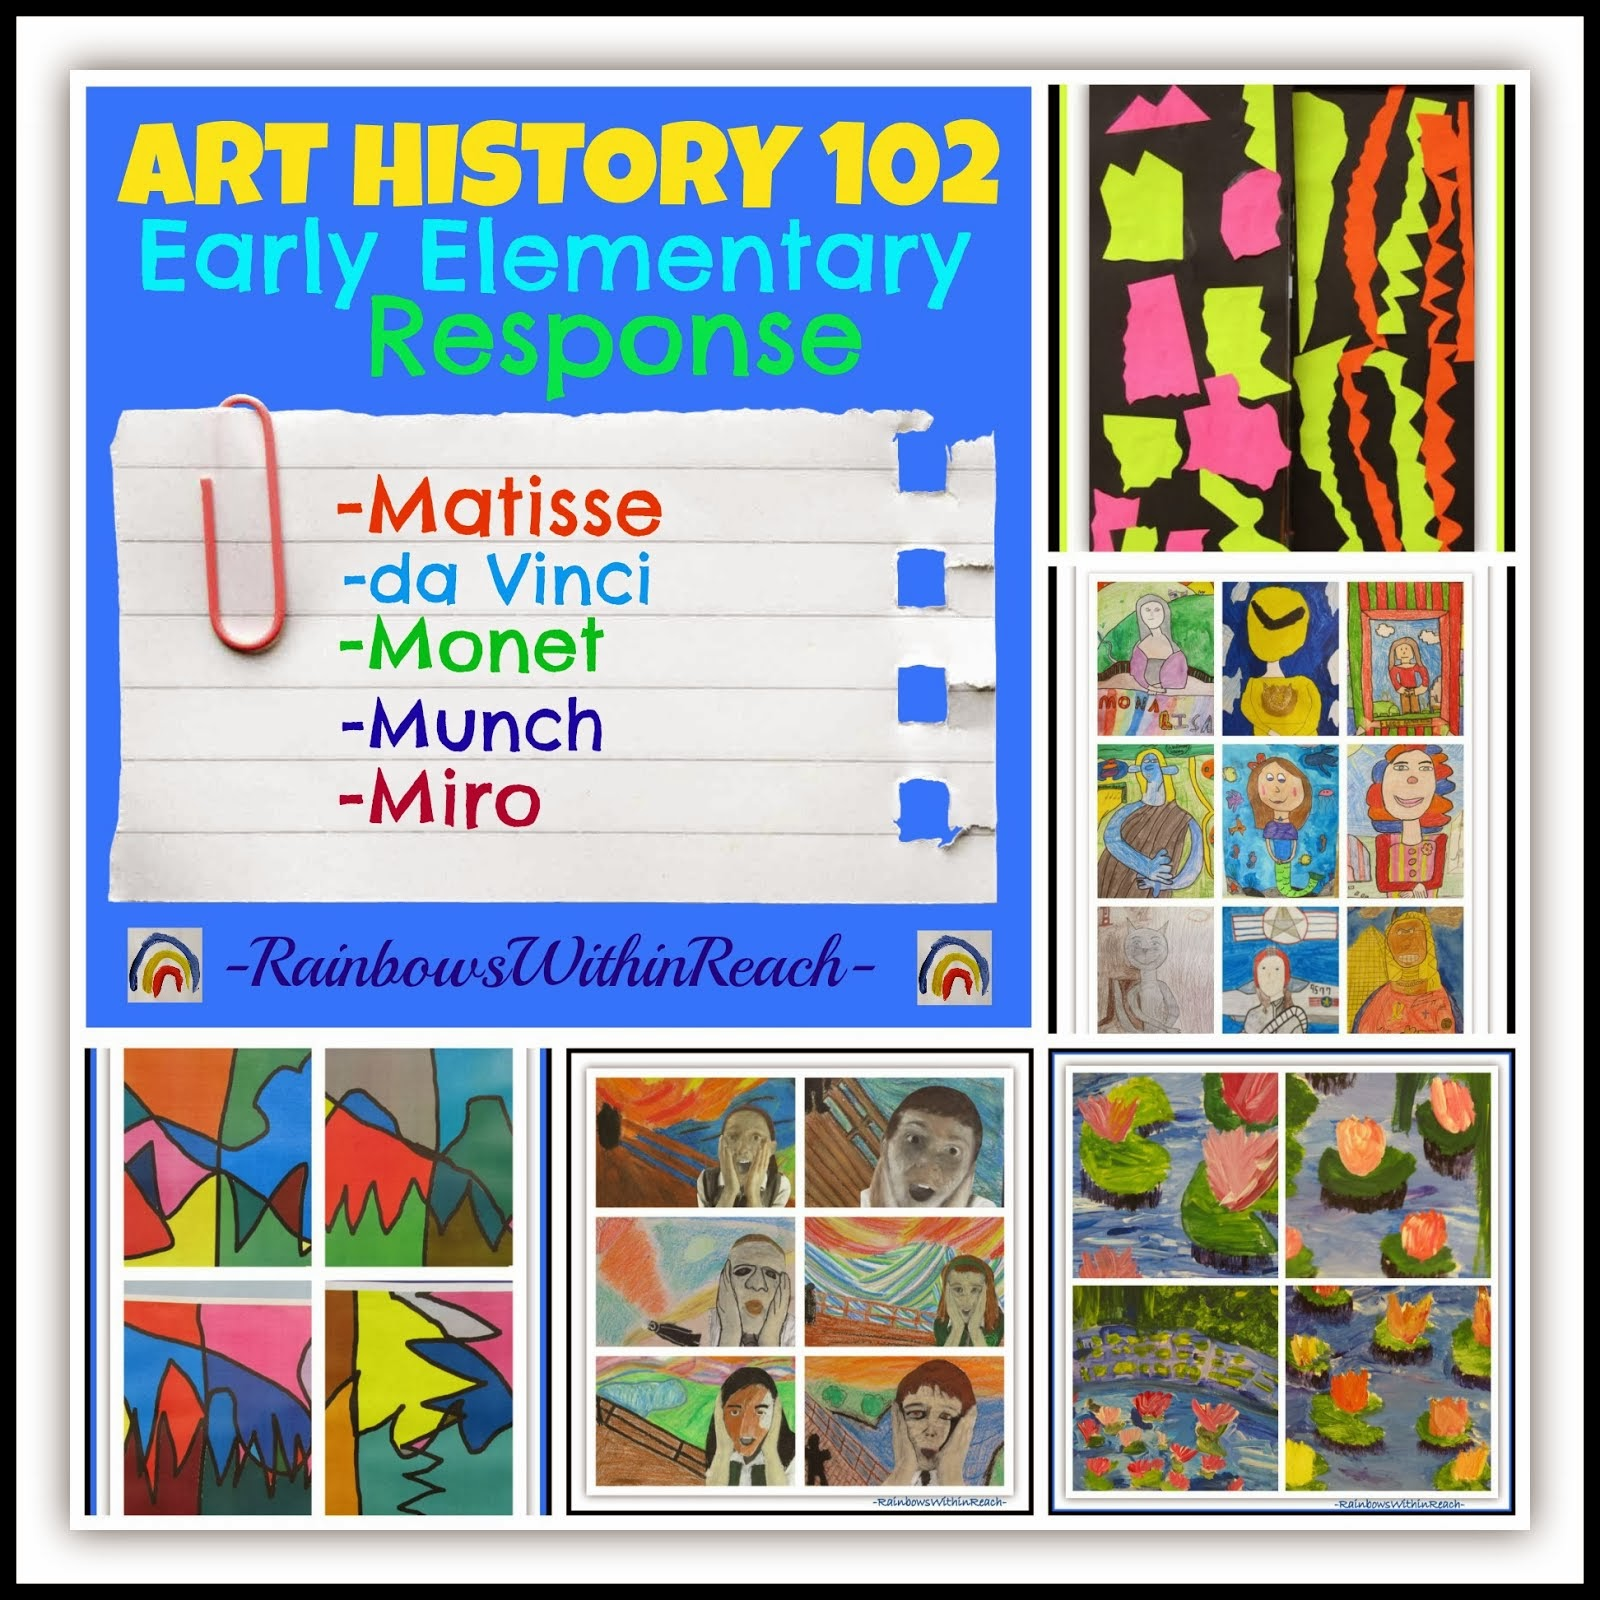 Art History 102